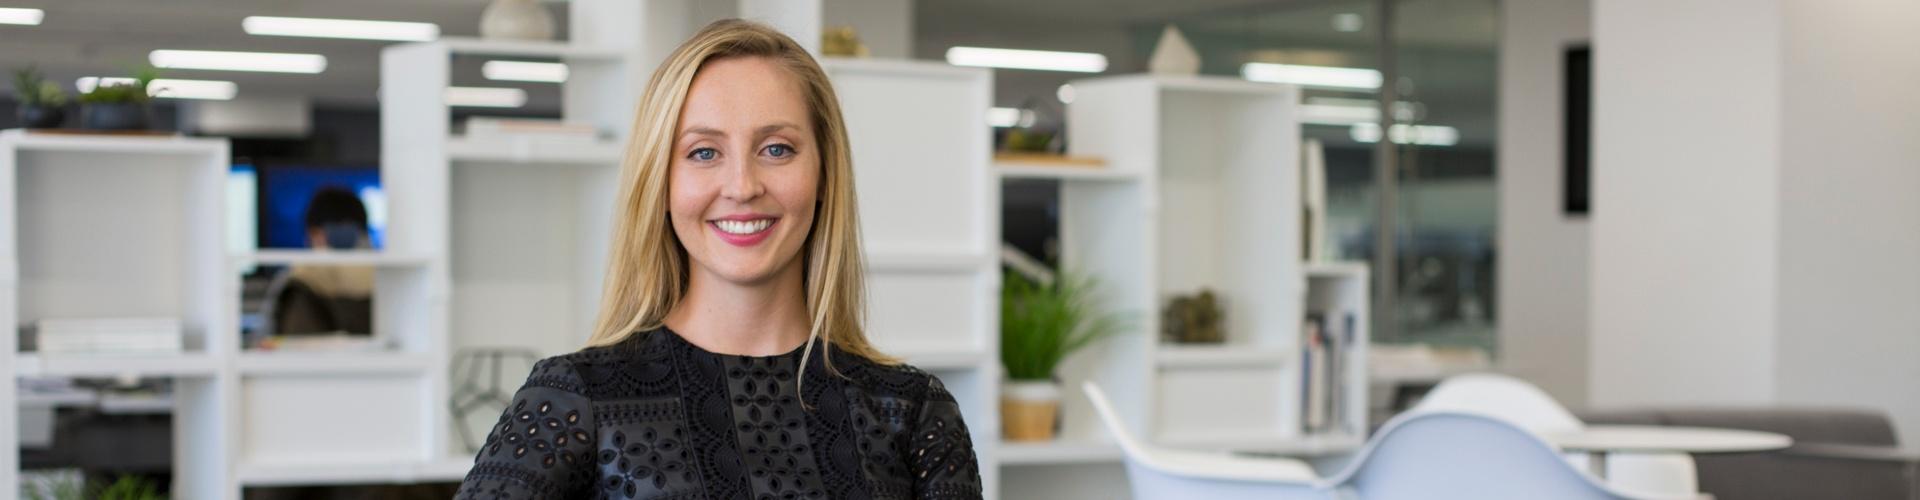 Staff Spotlight: Katrina Cavanough